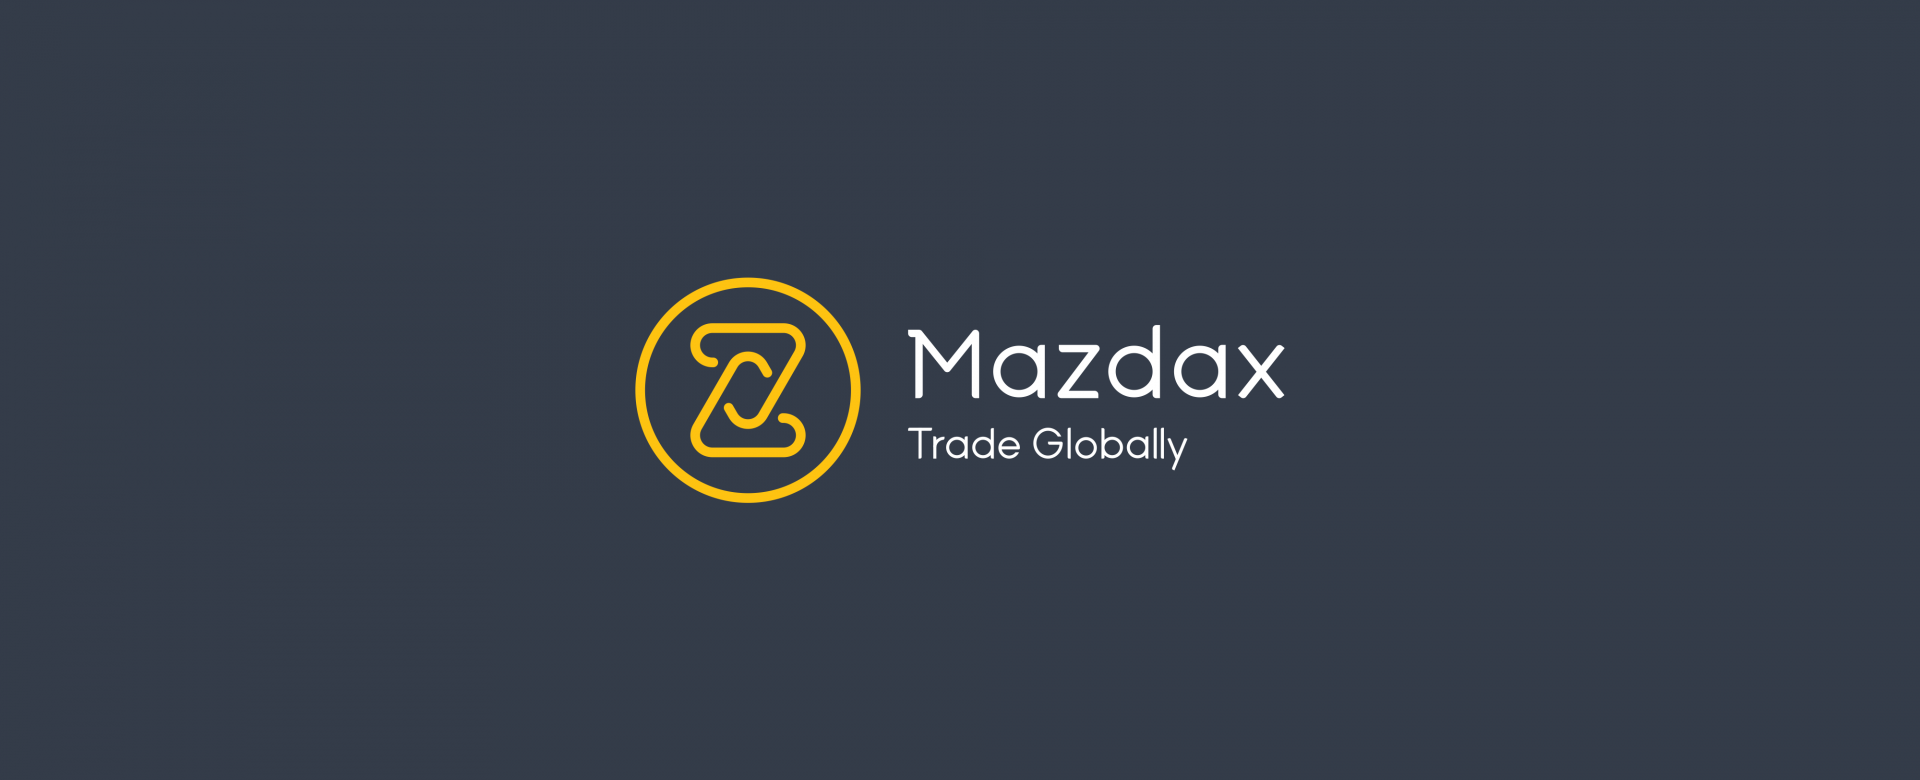 mazdax branding by zen brandiananding agency طراحی برند مزدکس